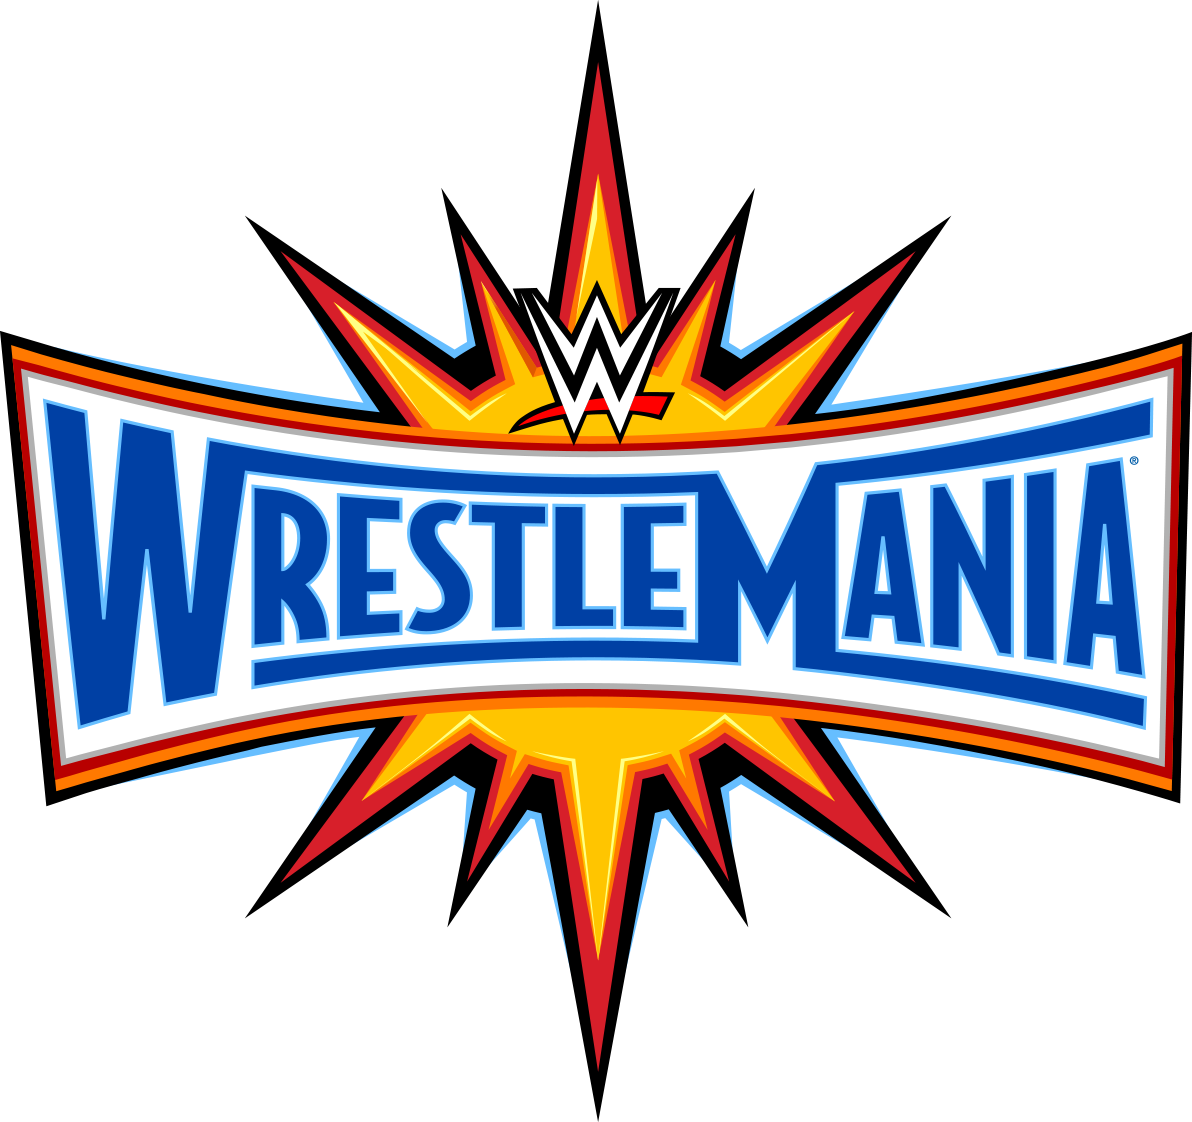 Pin By Remy Lebeau On Wwe Wwe Logo Wrestlemania Wrestlemania 33